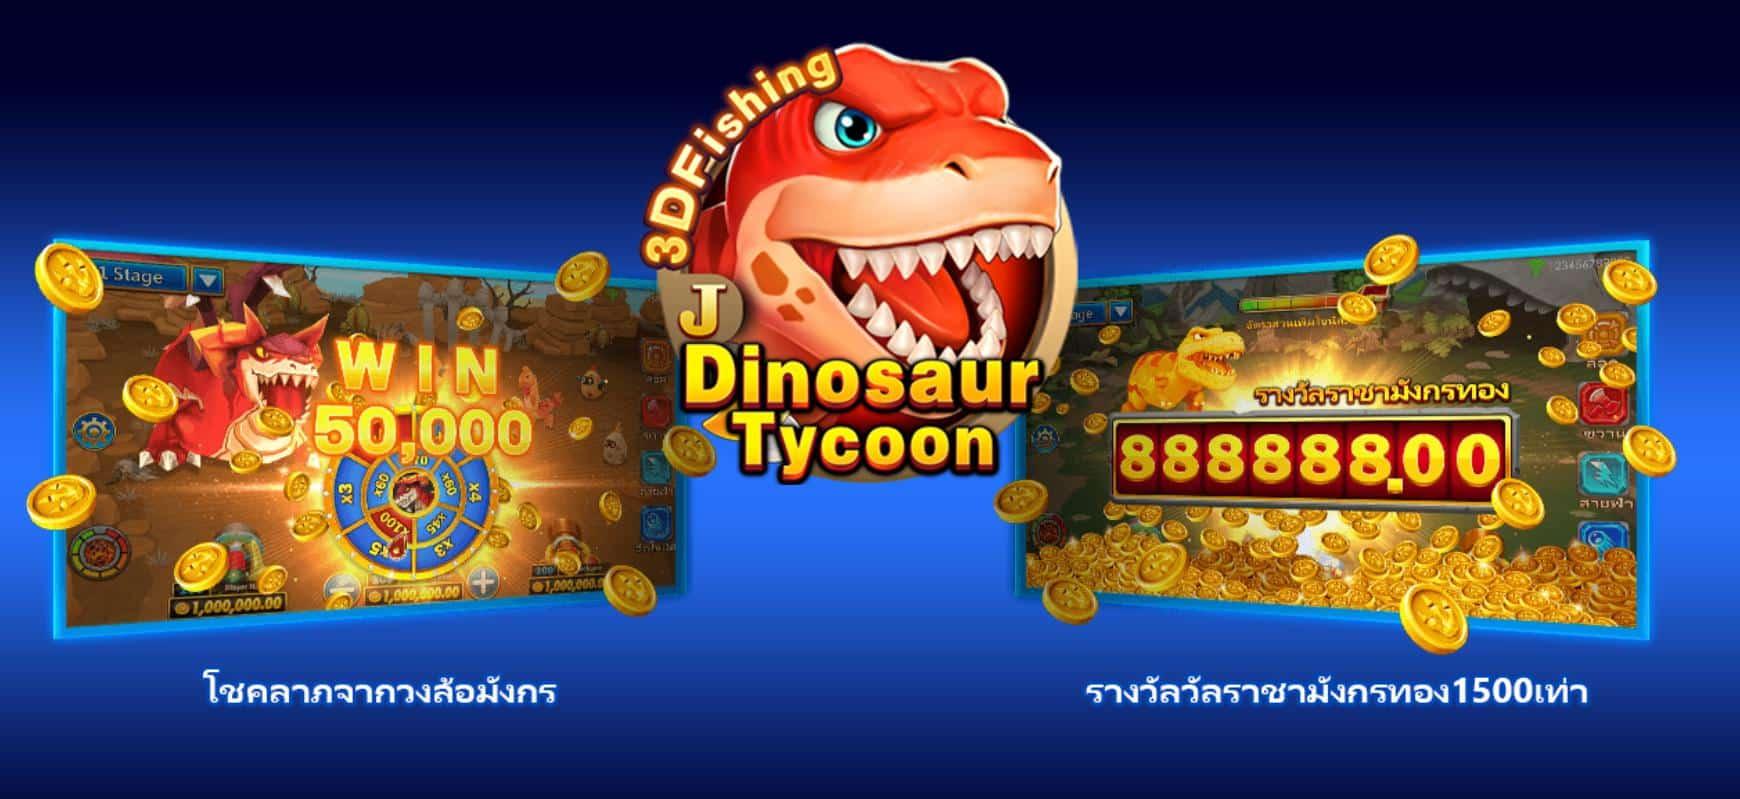 Dinosaur Tycoon เกมยิงไดโนเสาร์